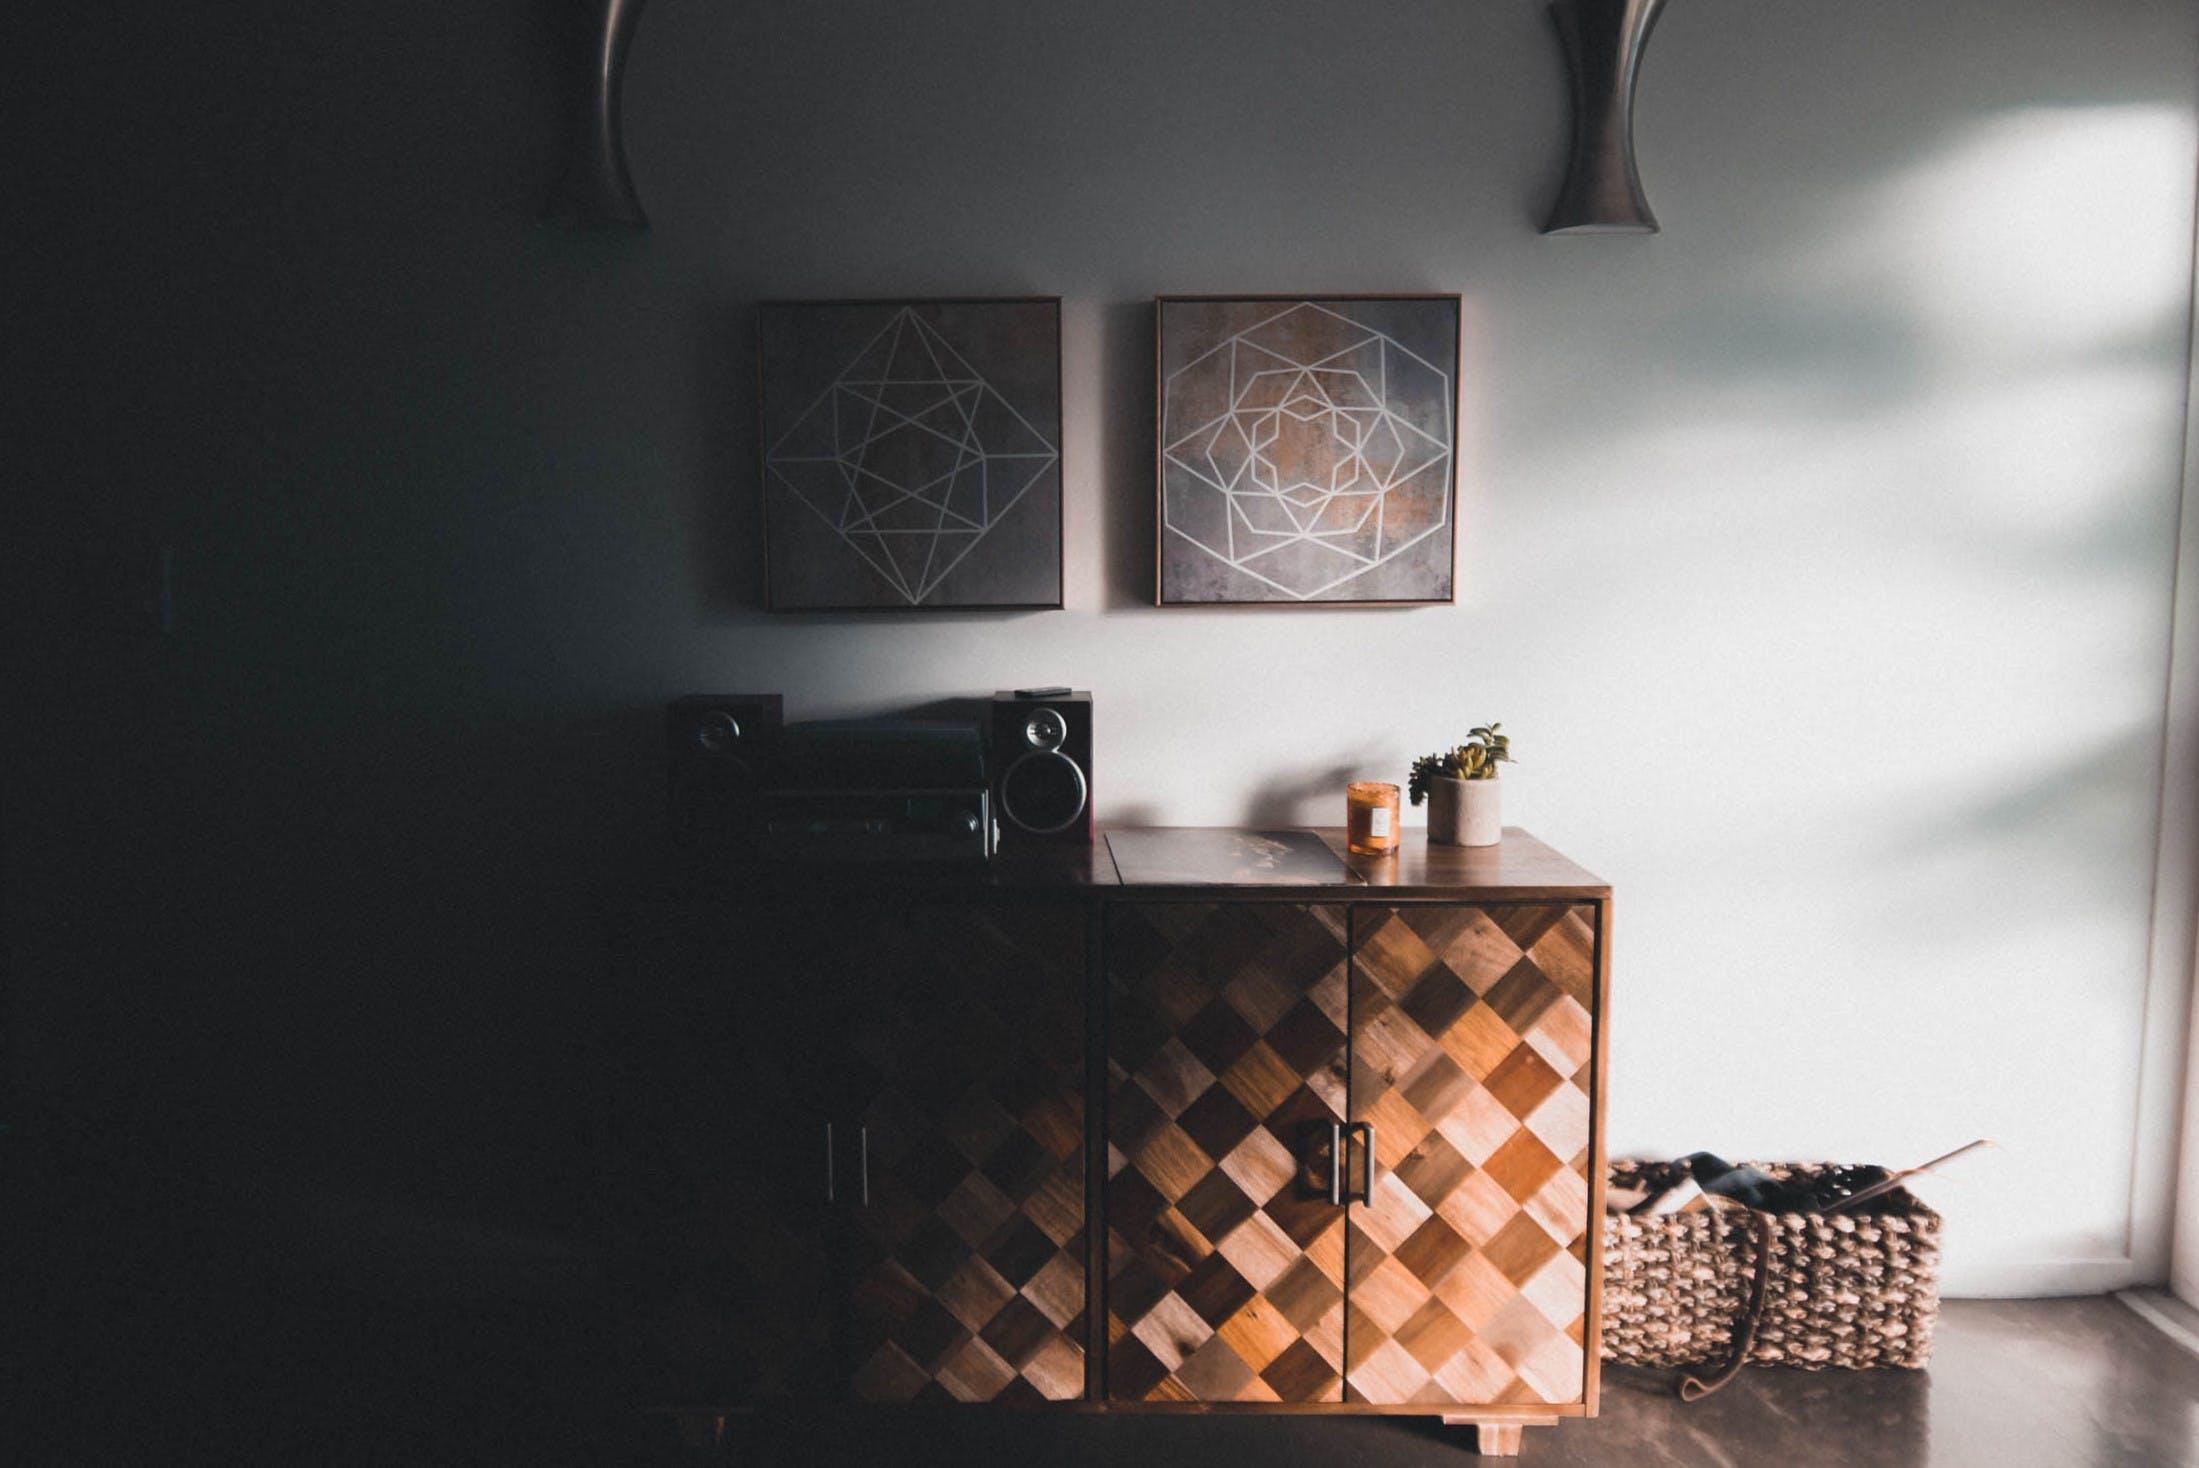 Black Audio Speaker on Brown Wooden Cabinet